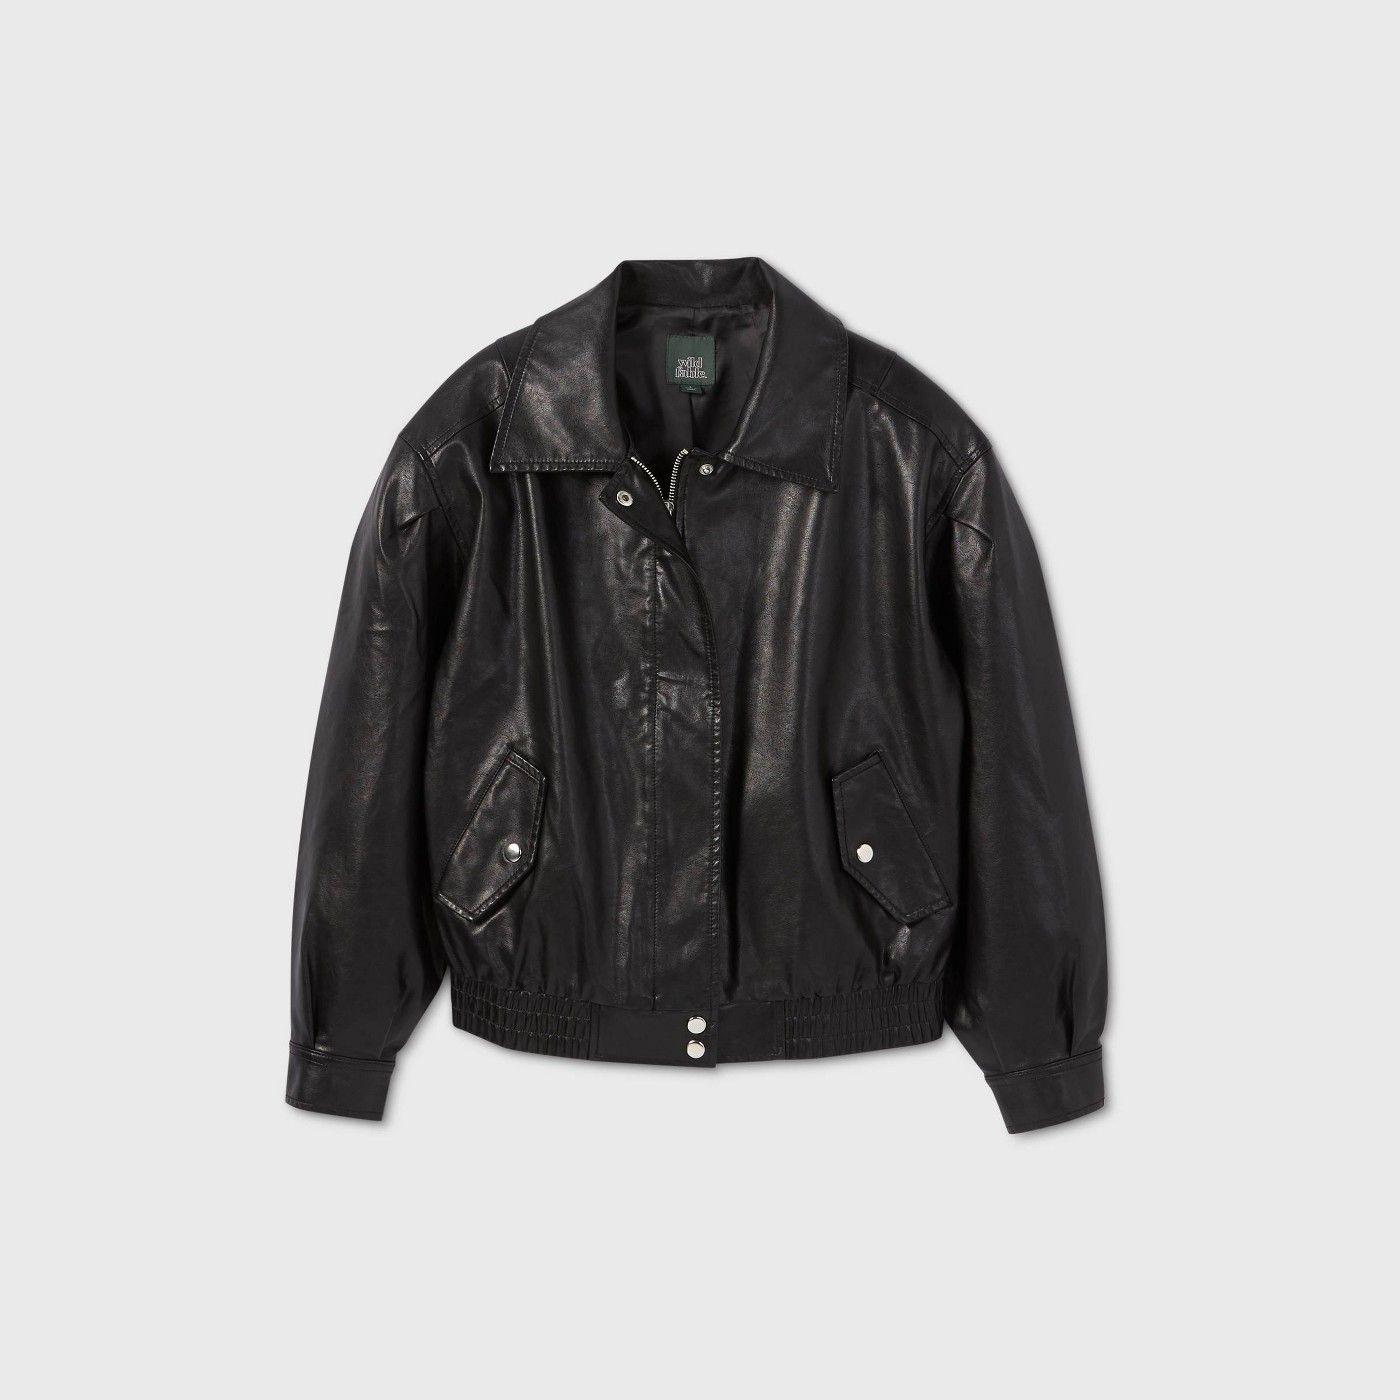 Women S Faux Leather Bomber Jacket Wild Fable Black Sponsored Leather Ad Faux Leather Bomber Jacket Leather Jackets Women Black Leather Jacket Outfit [ 1400 x 1400 Pixel ]